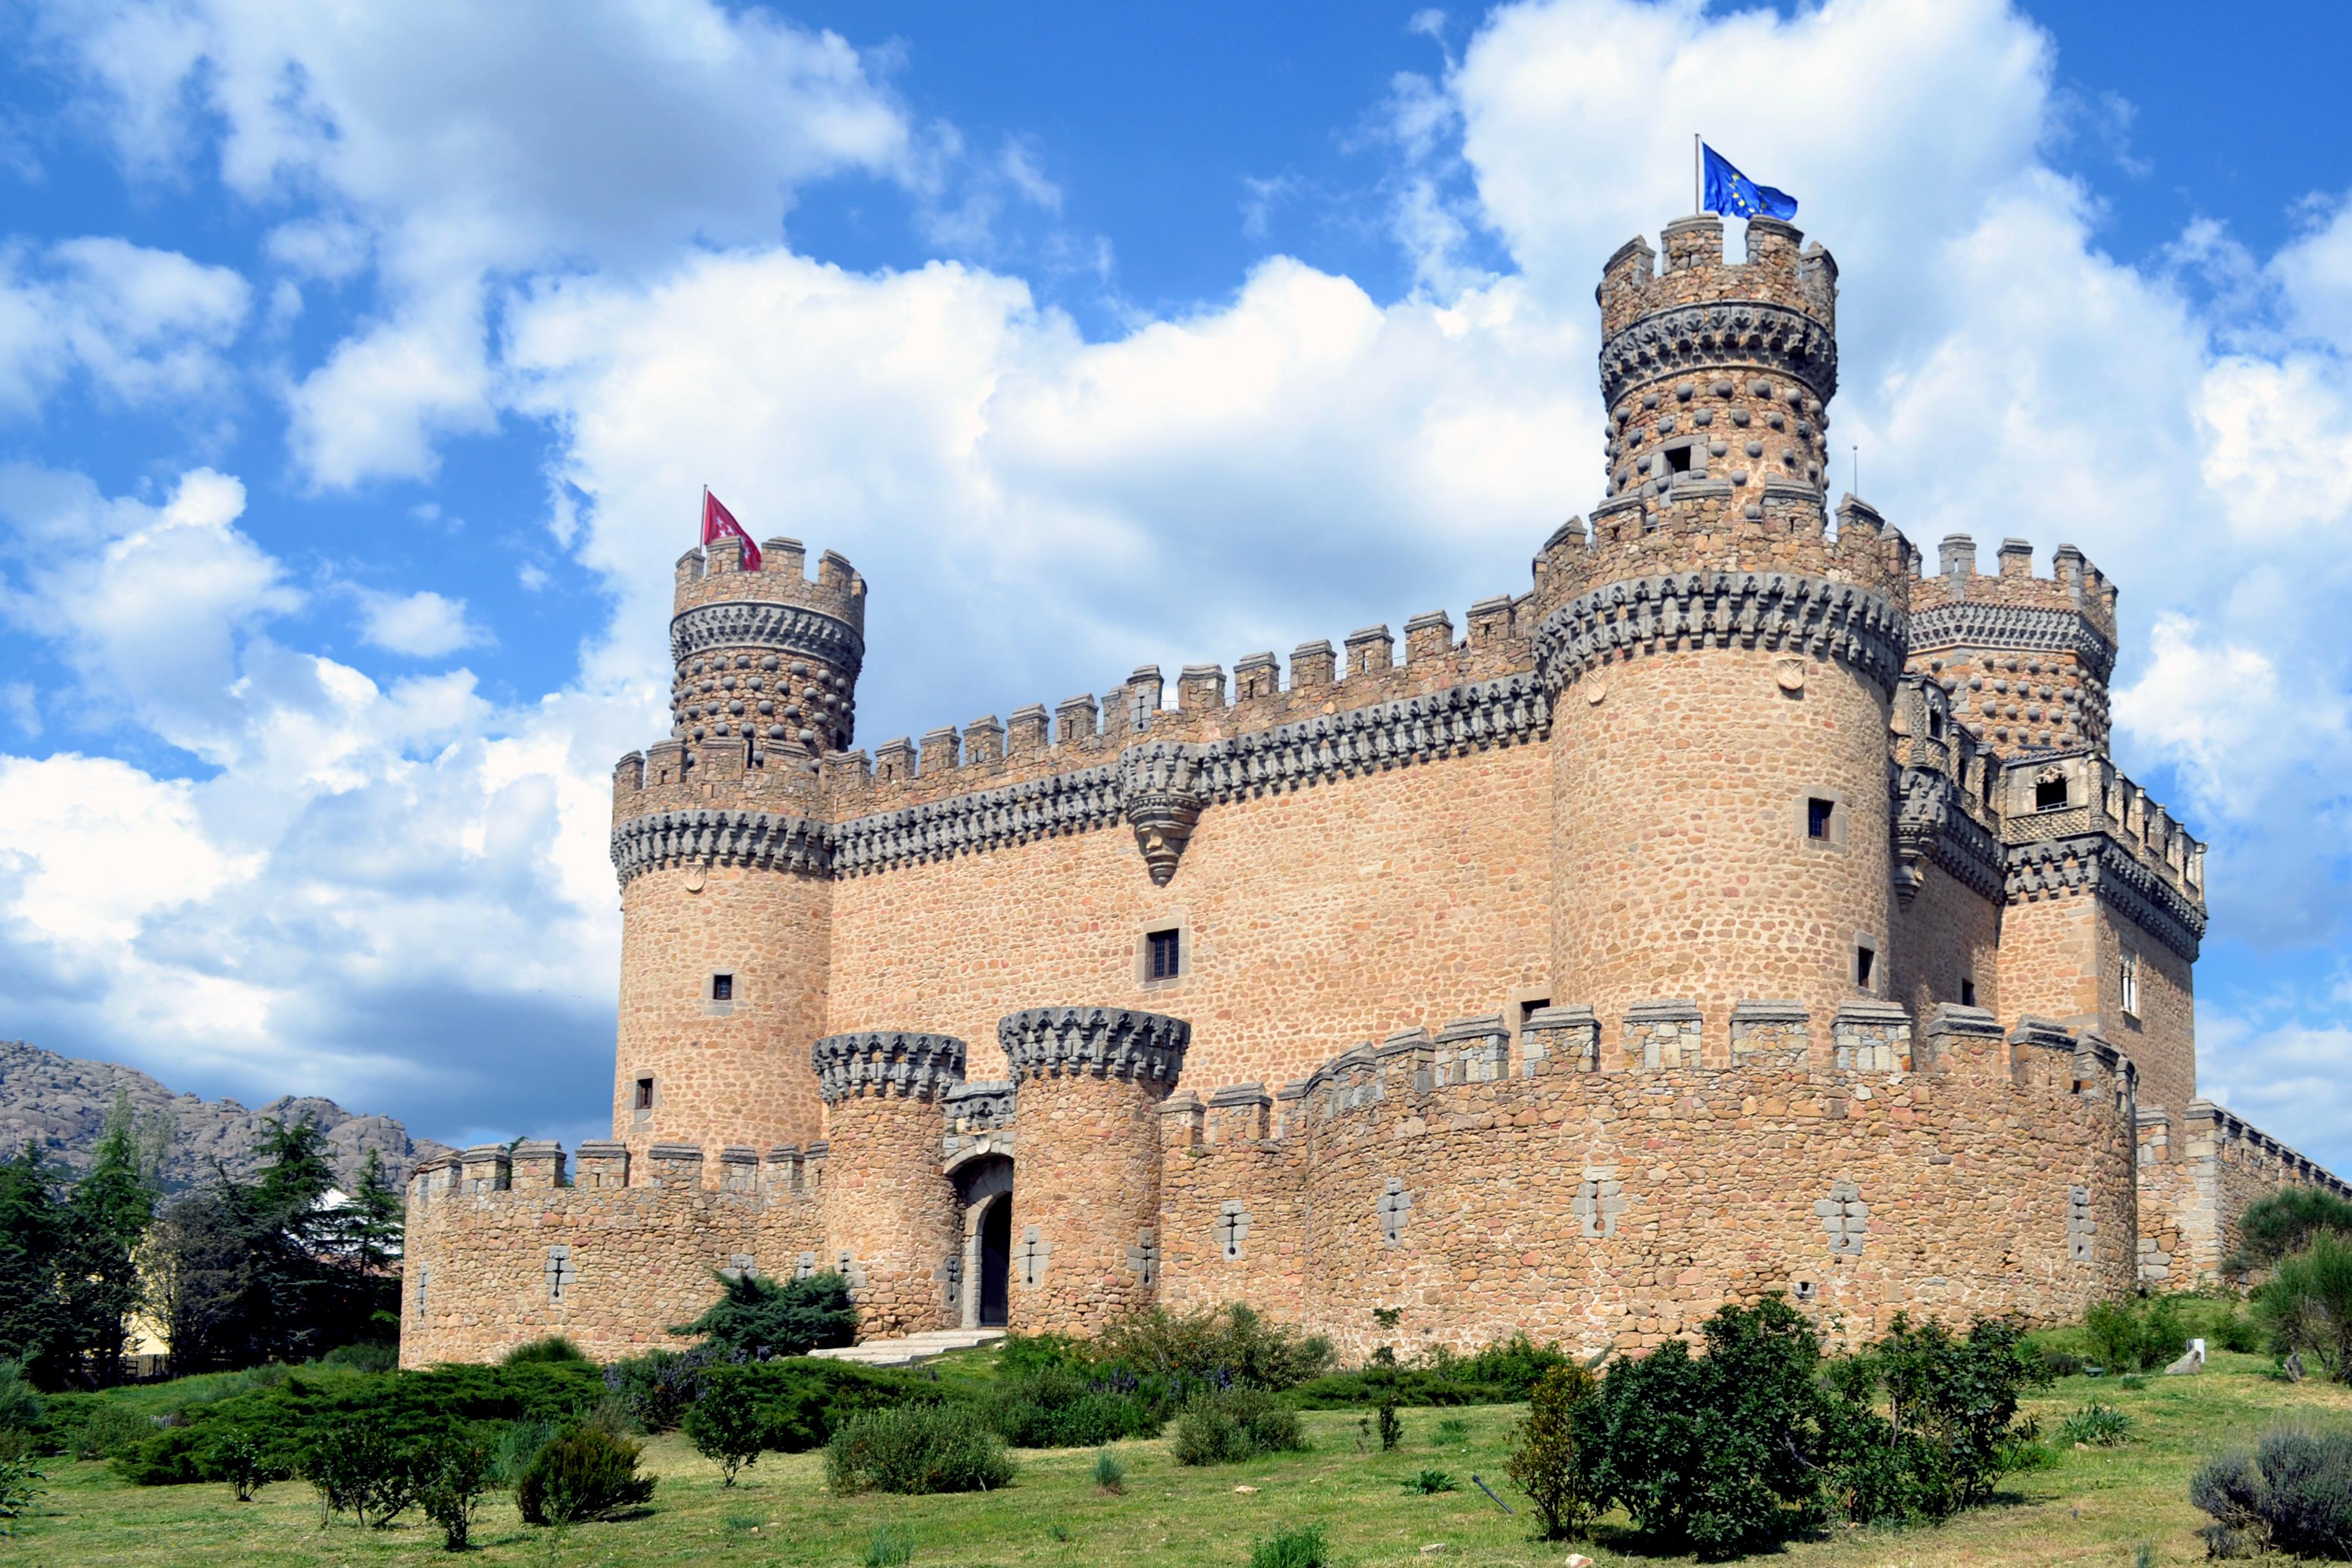 Fotos de leopoldo castillo 8